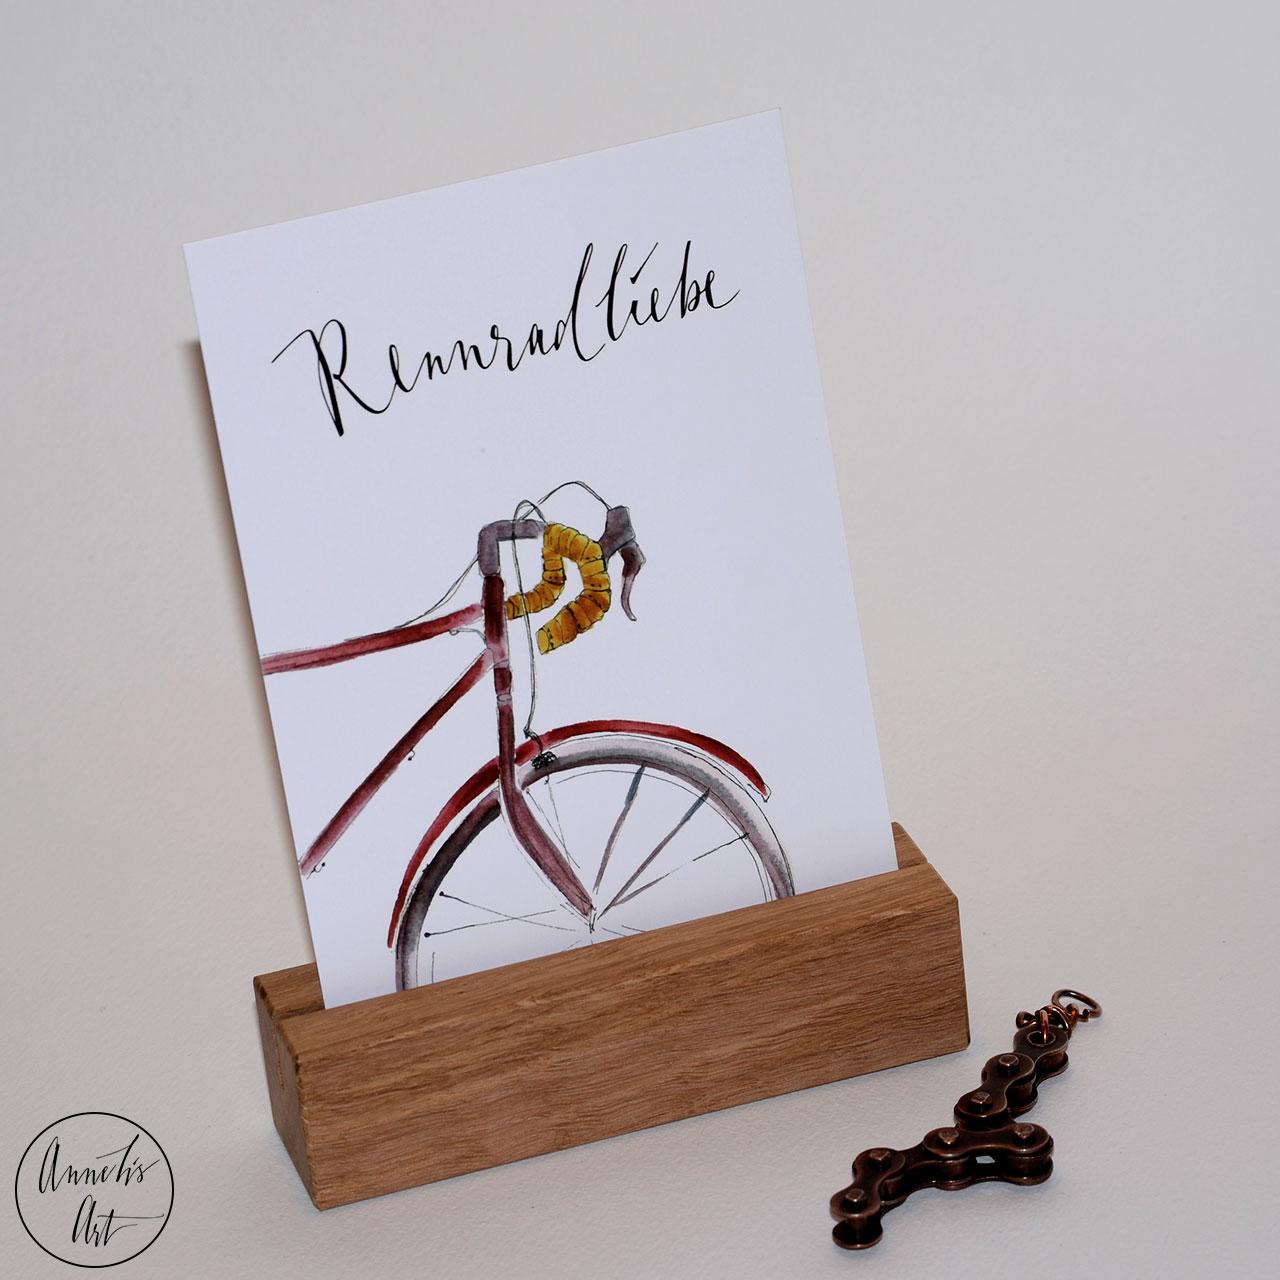 Postkarte Rennradliebe